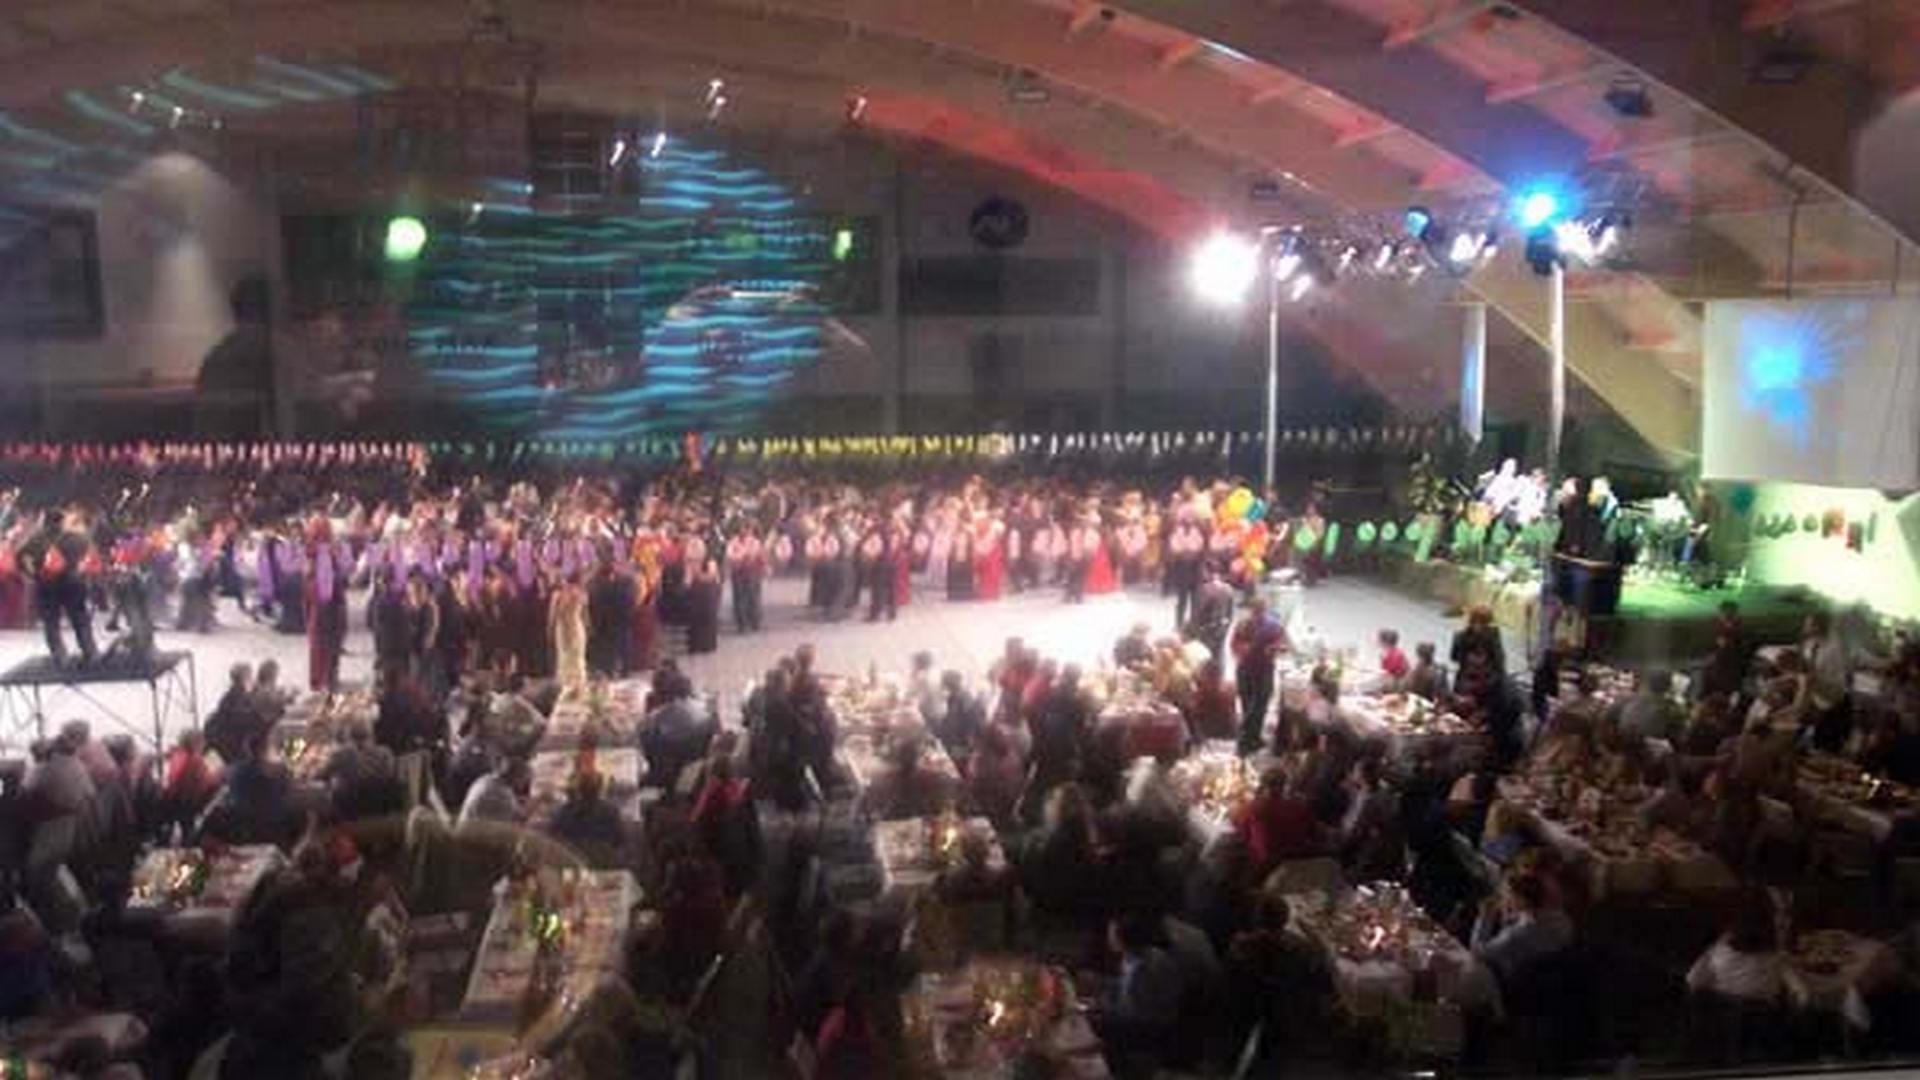 ansambel band za poroko abrahama maturantski ples